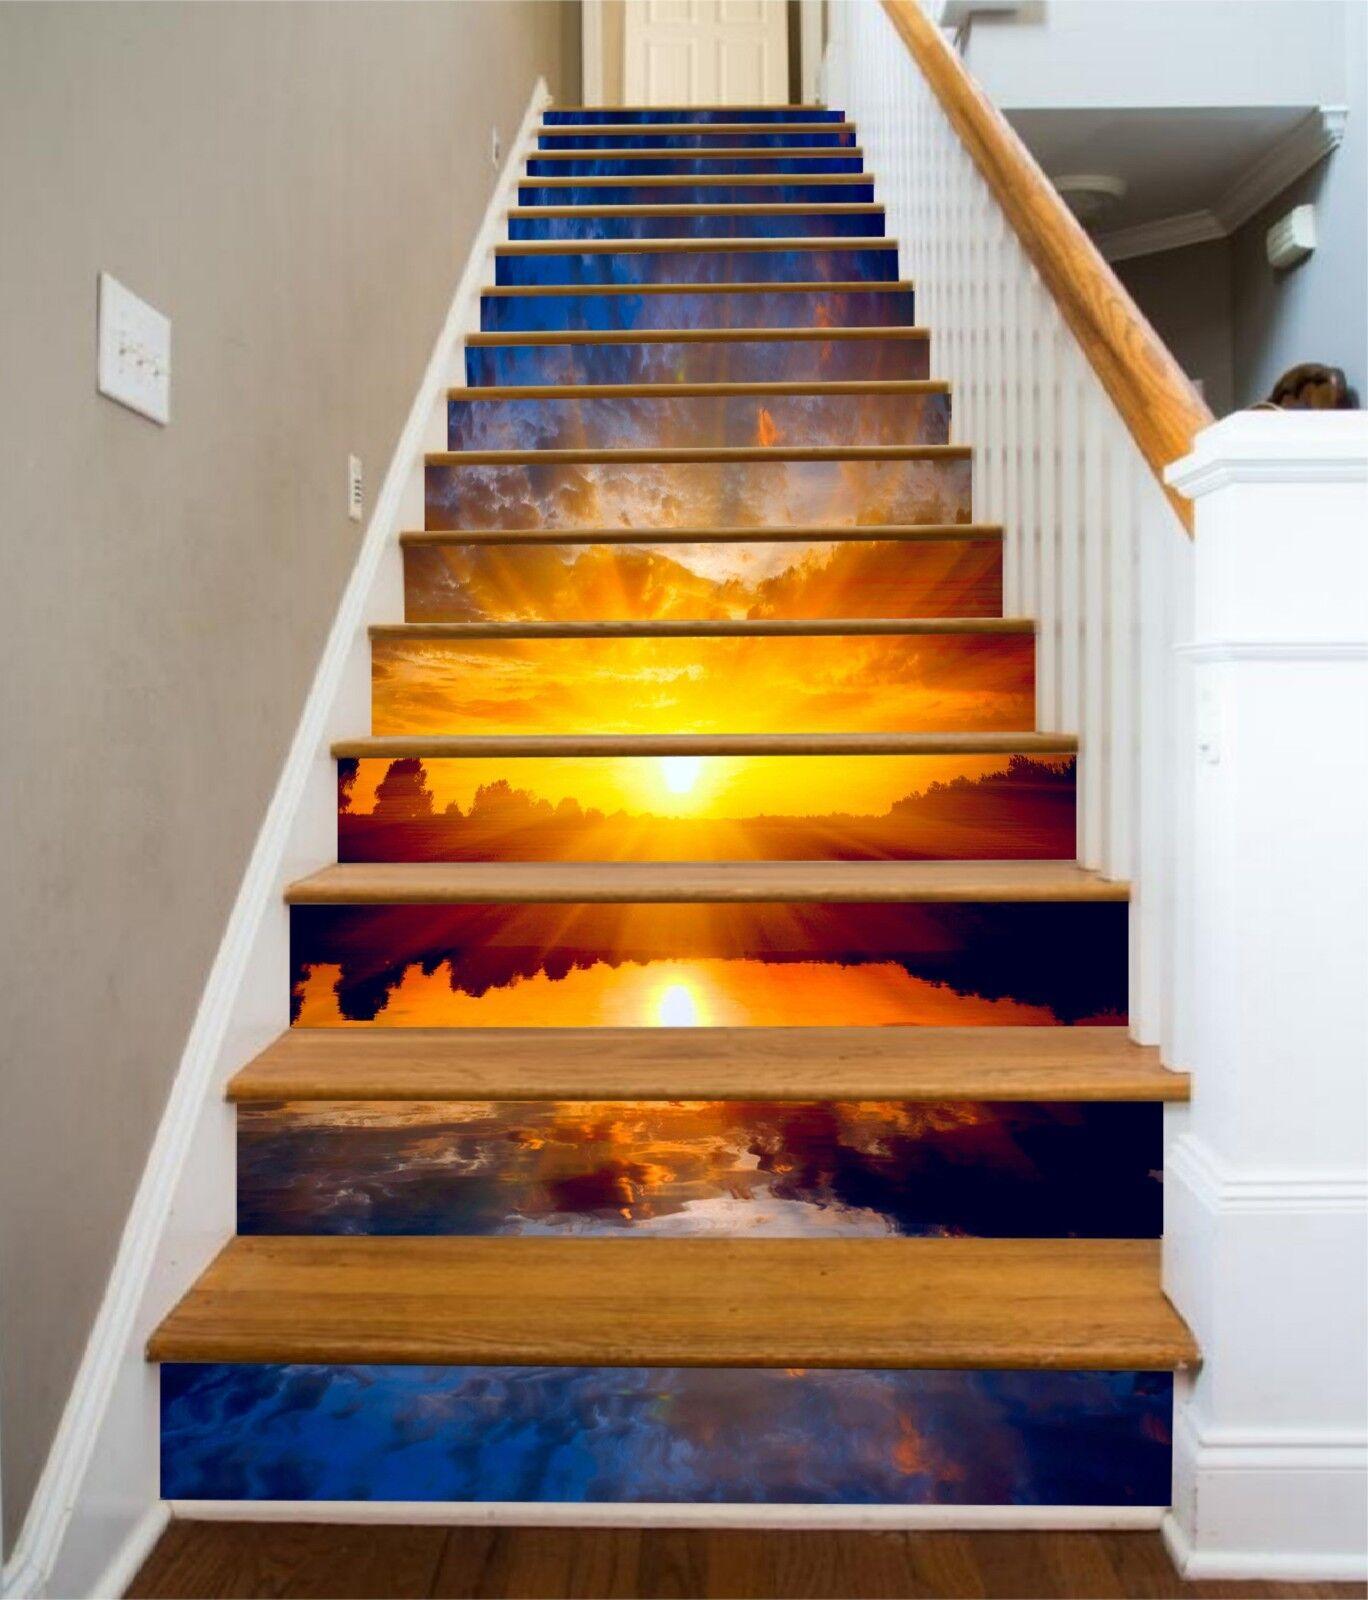 3D Sky Sunset Stair Risers Decoration Photo Mural Vinyl Decal WandPapier CA